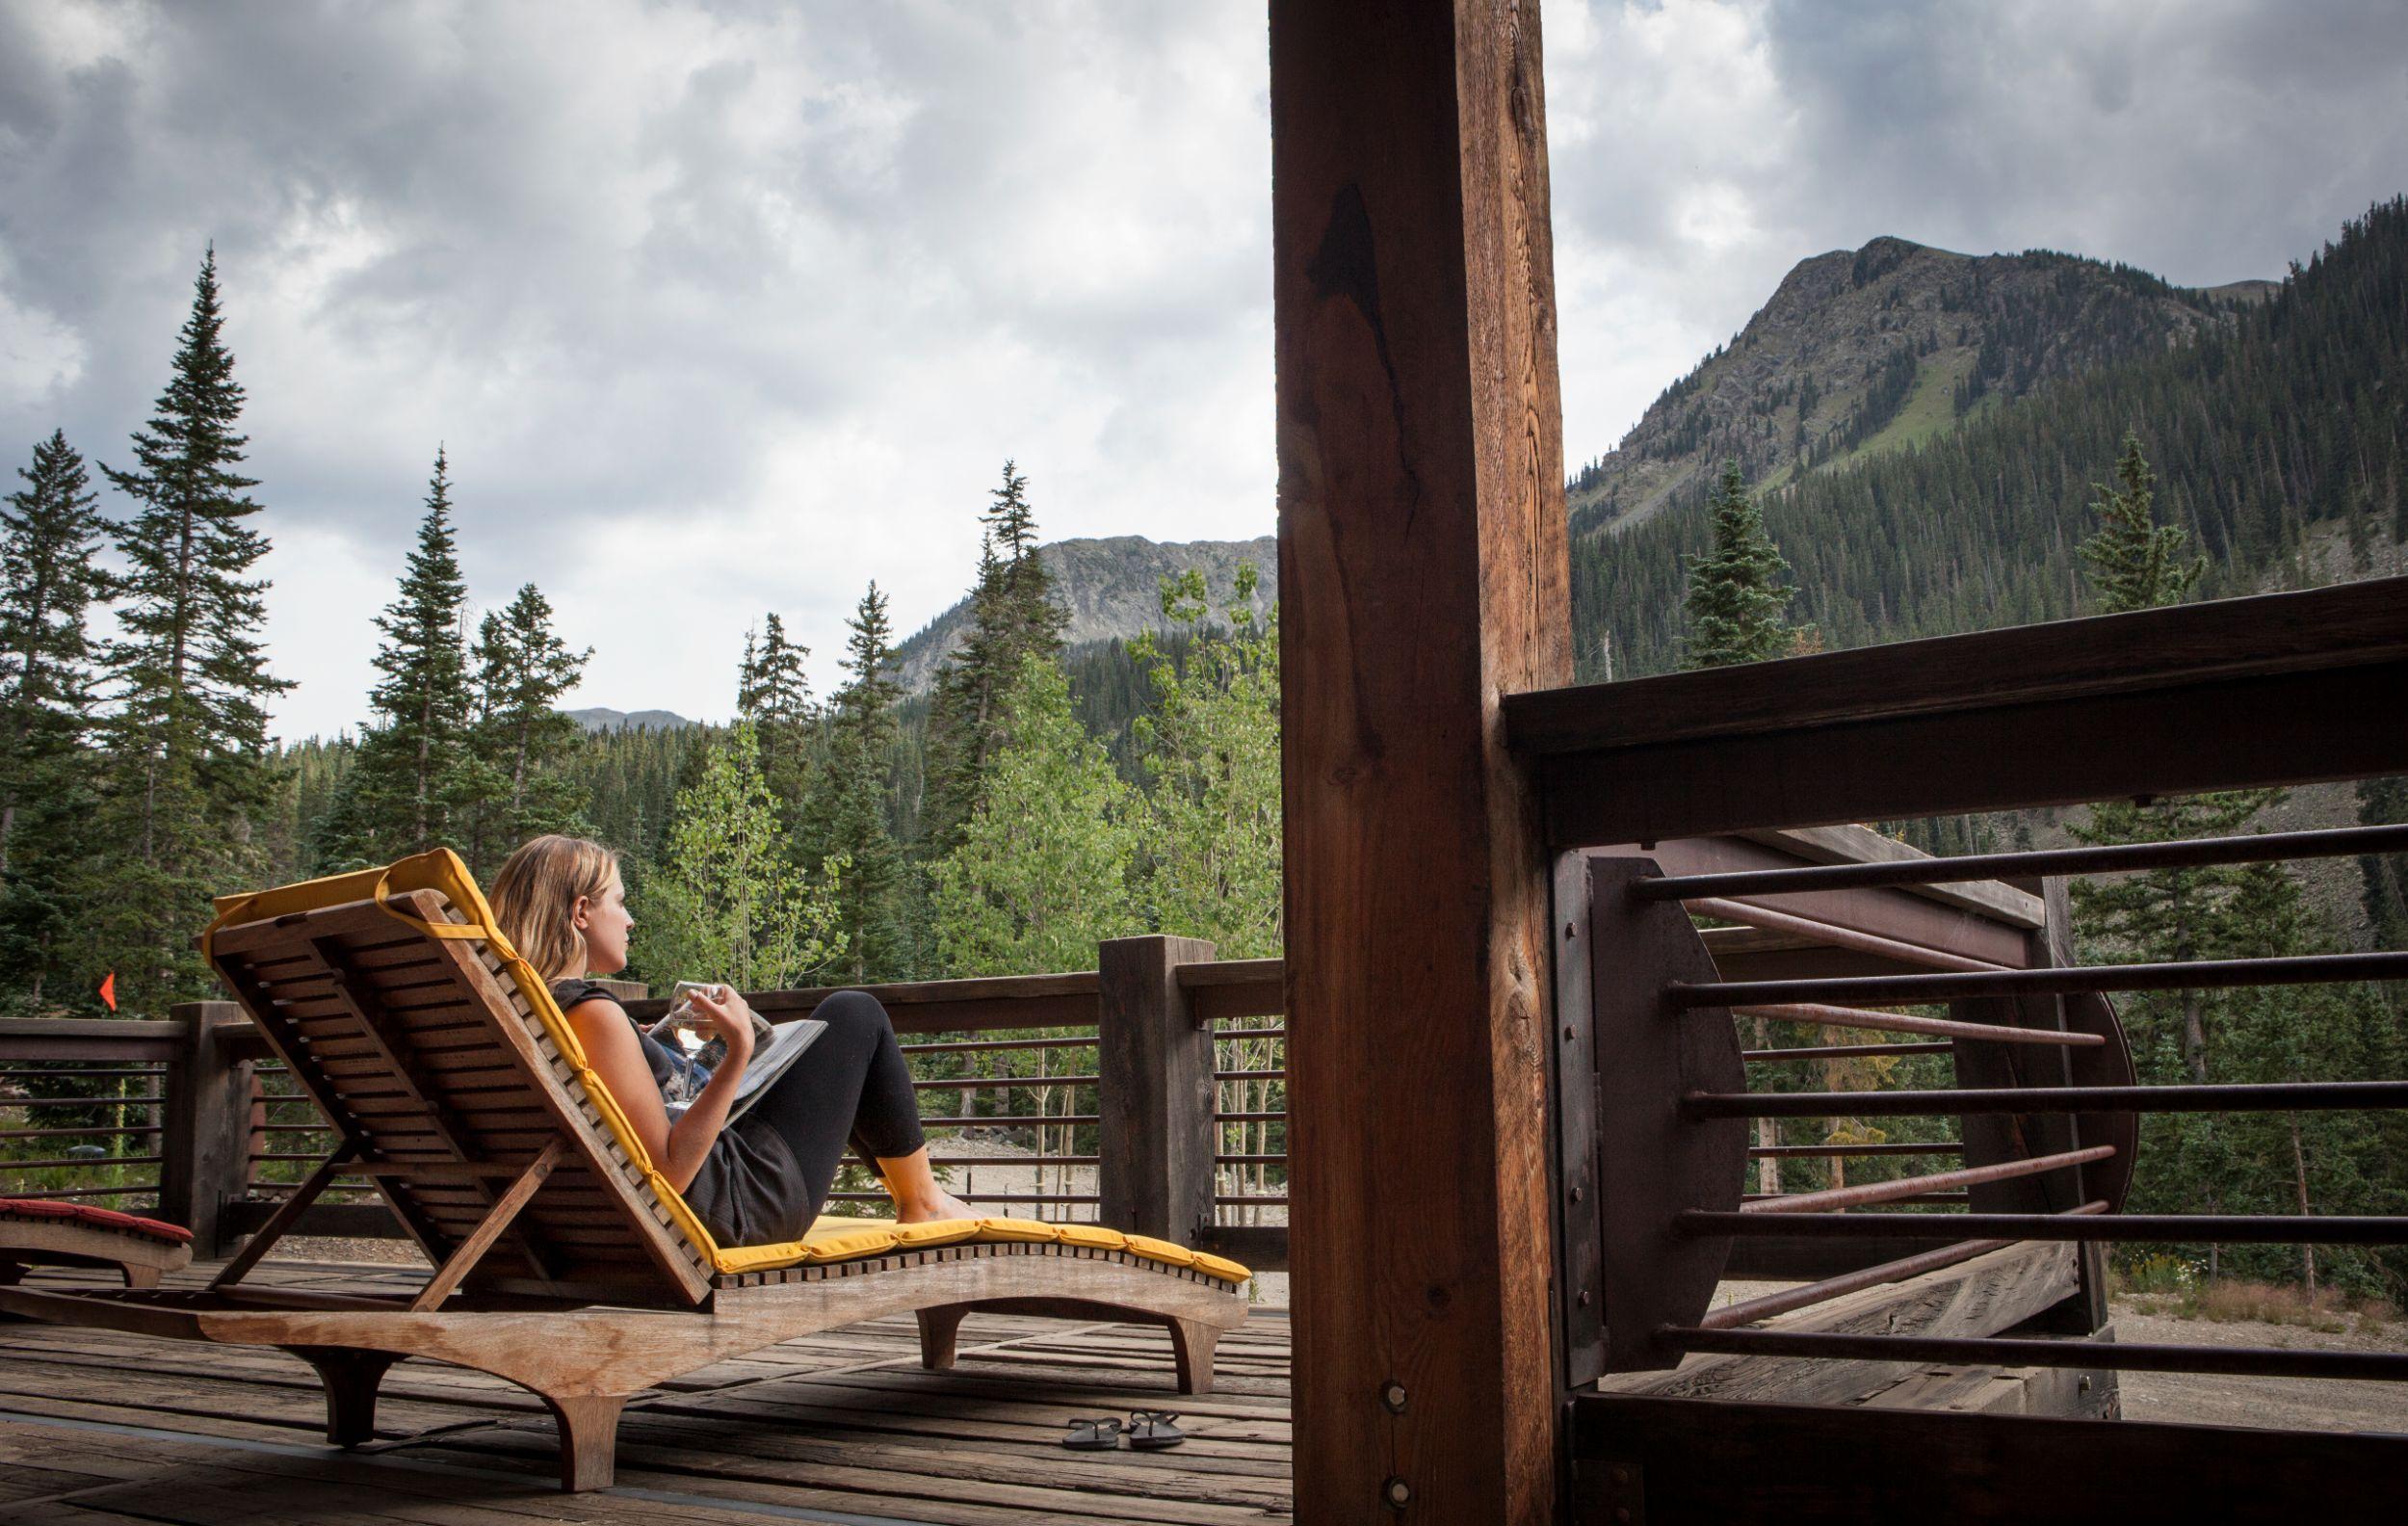 RPH-110814-Wilderness-Lodge-Taos-9367.jpg